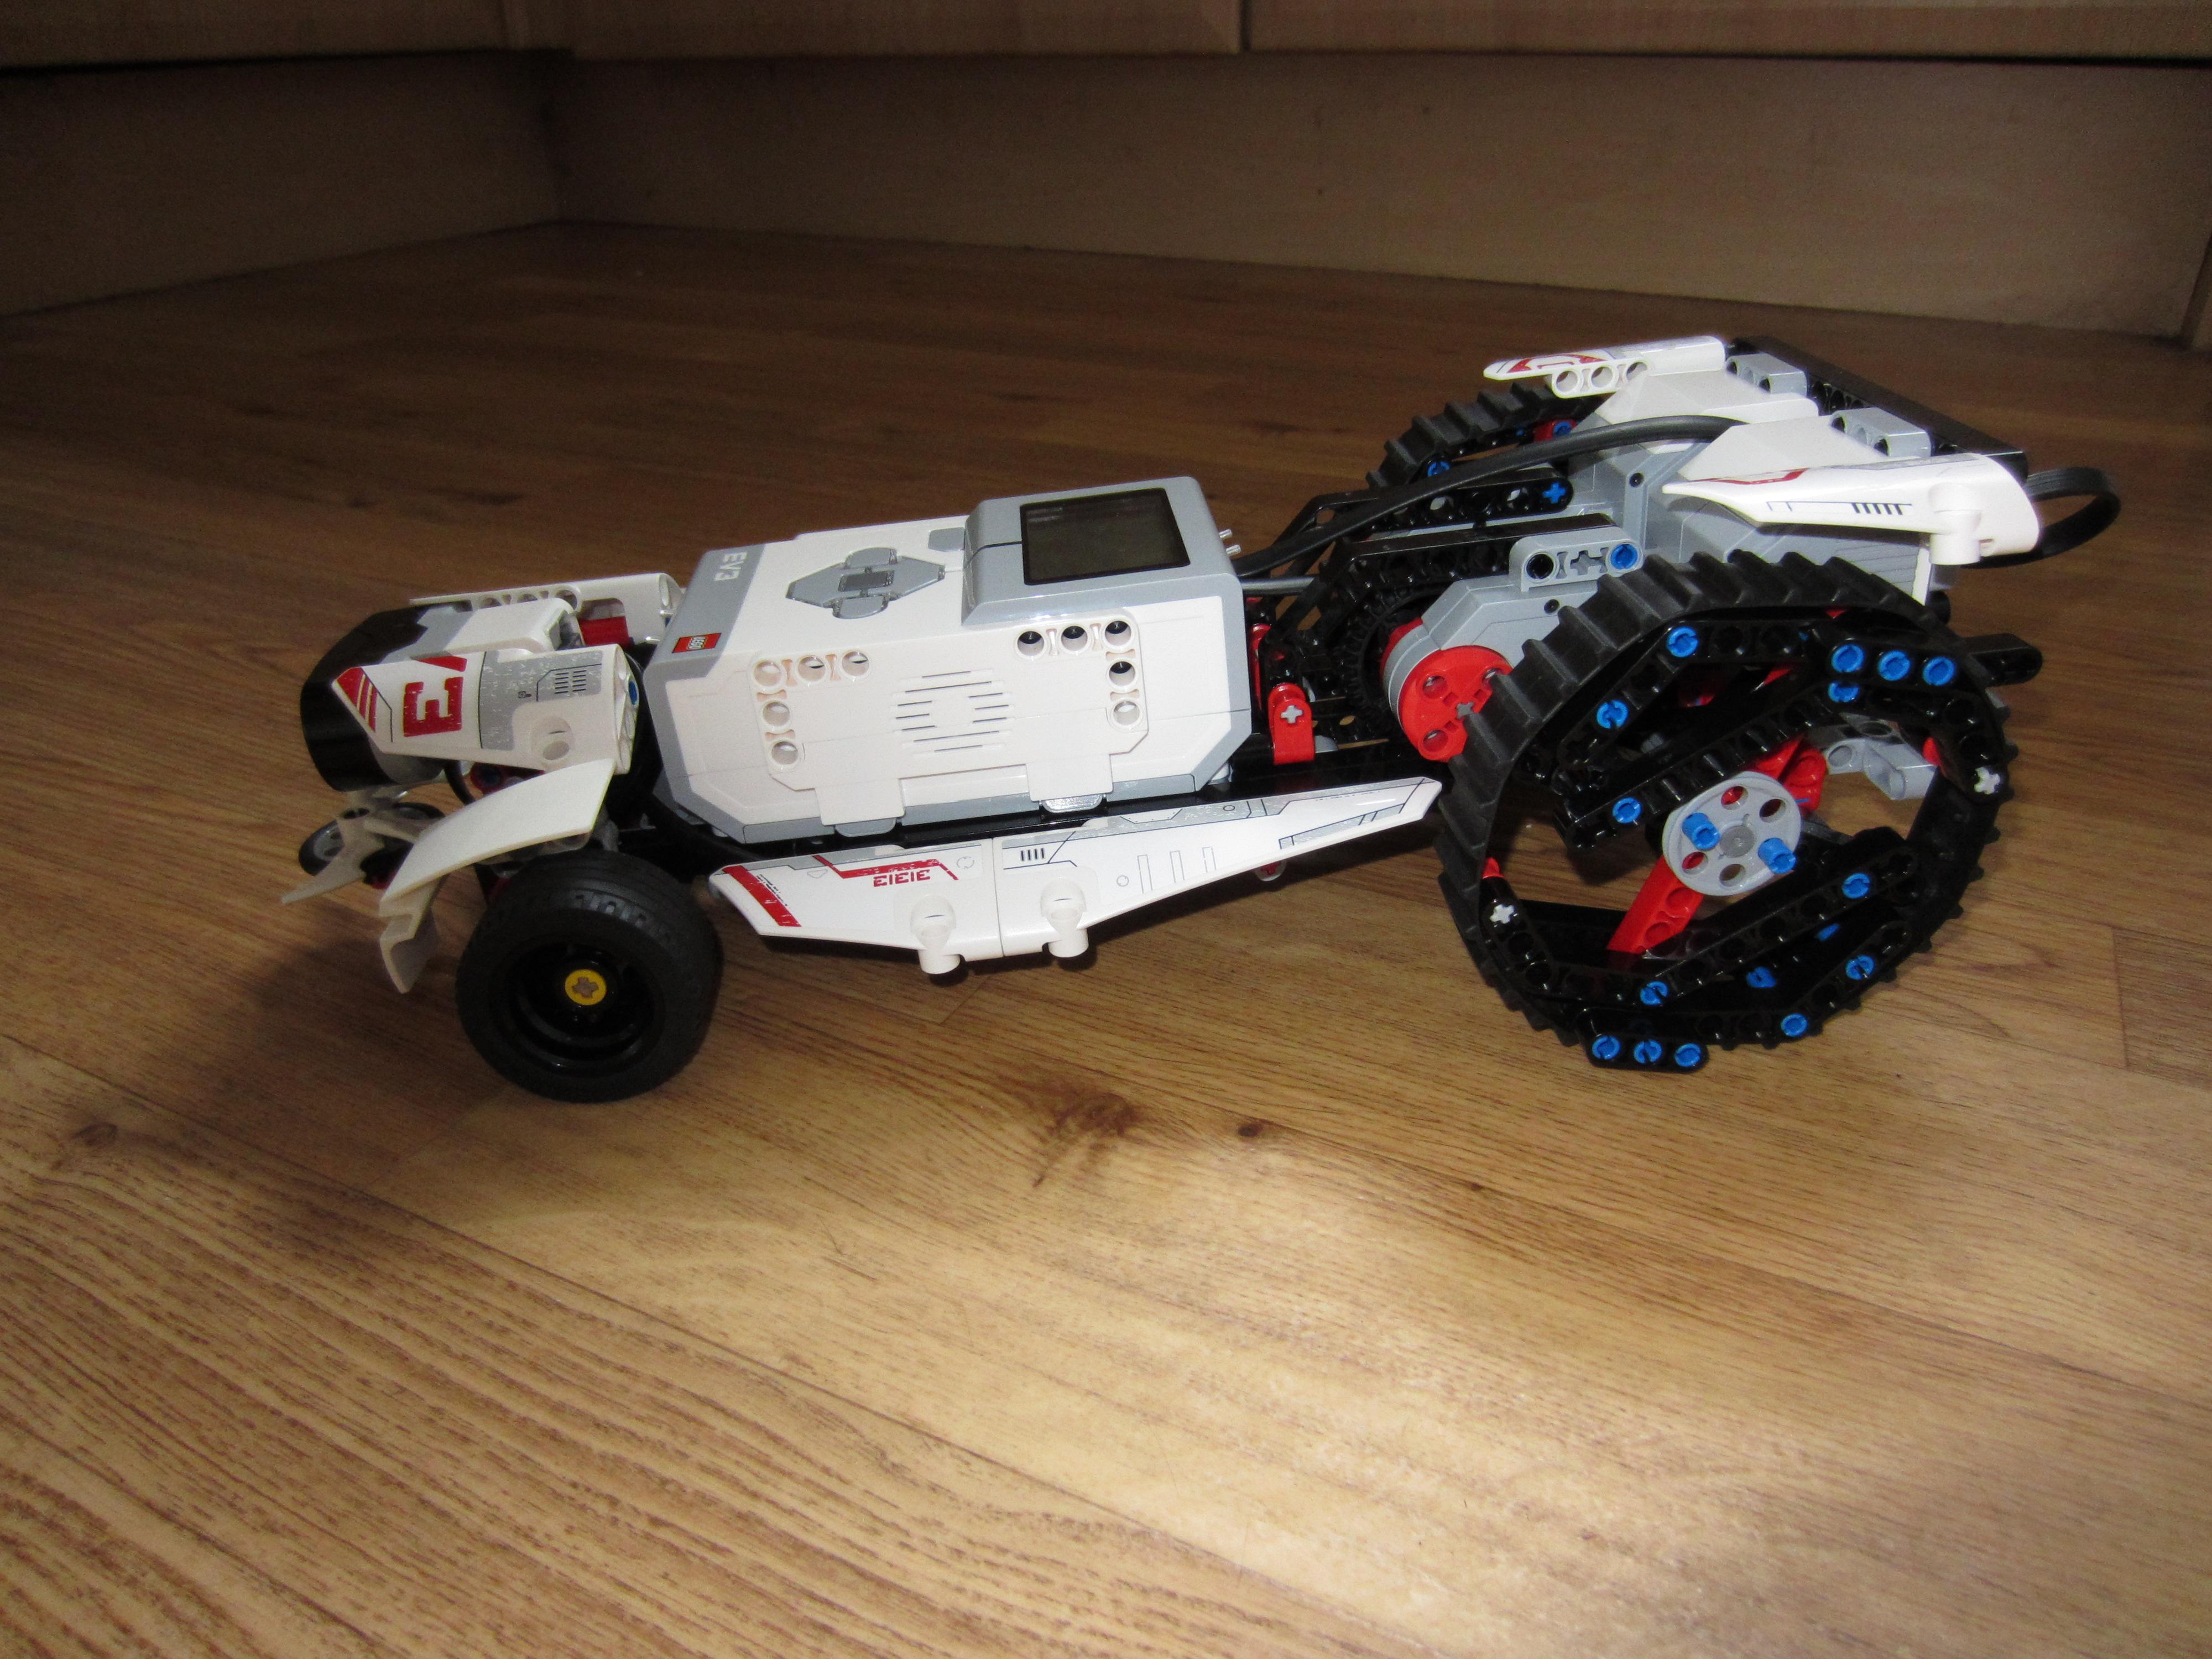 Tractor Rac3r - 31313 C-model - Bricksafe